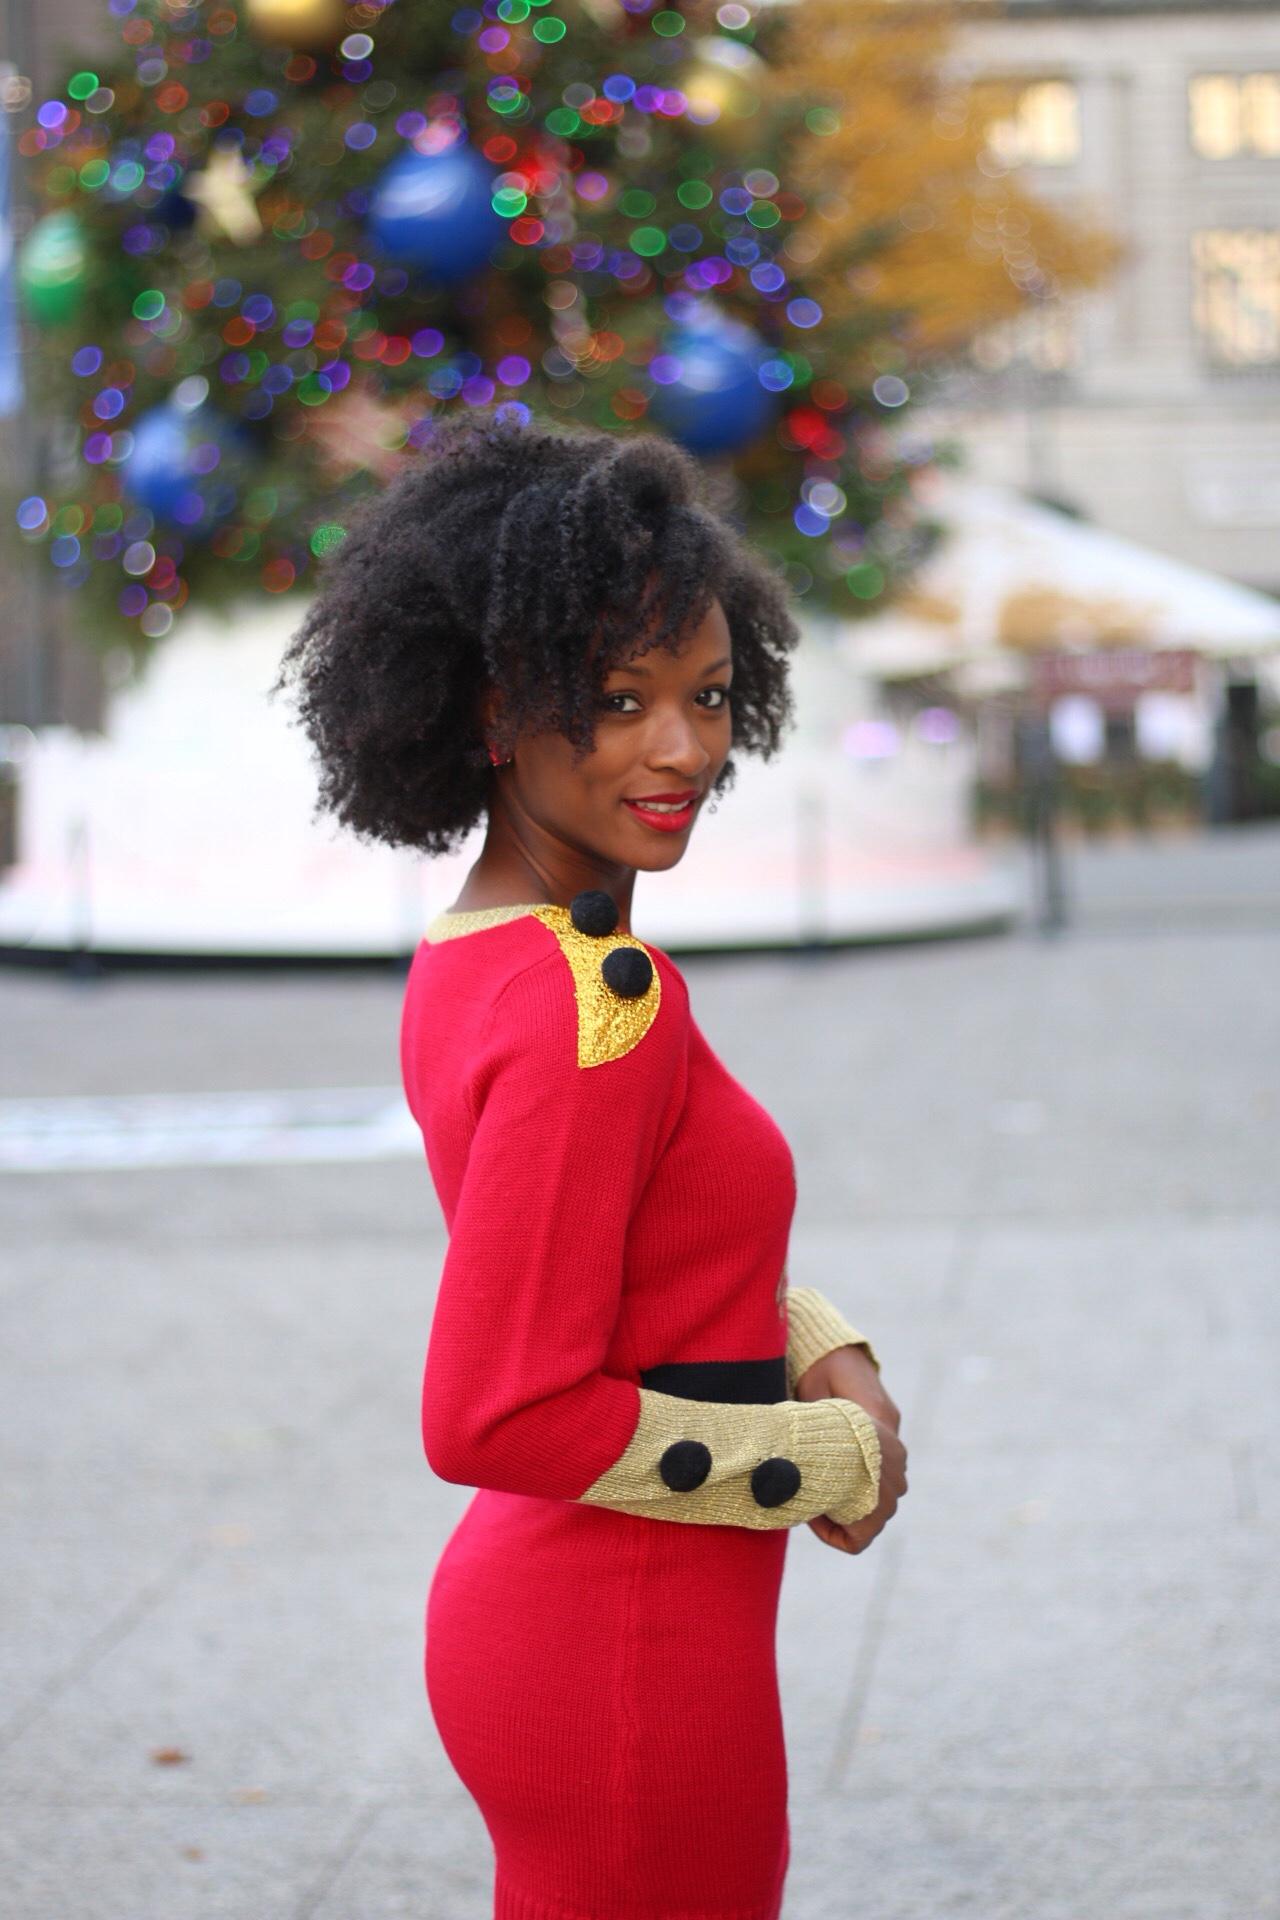 Nutcracker Holiday Sweater Dress